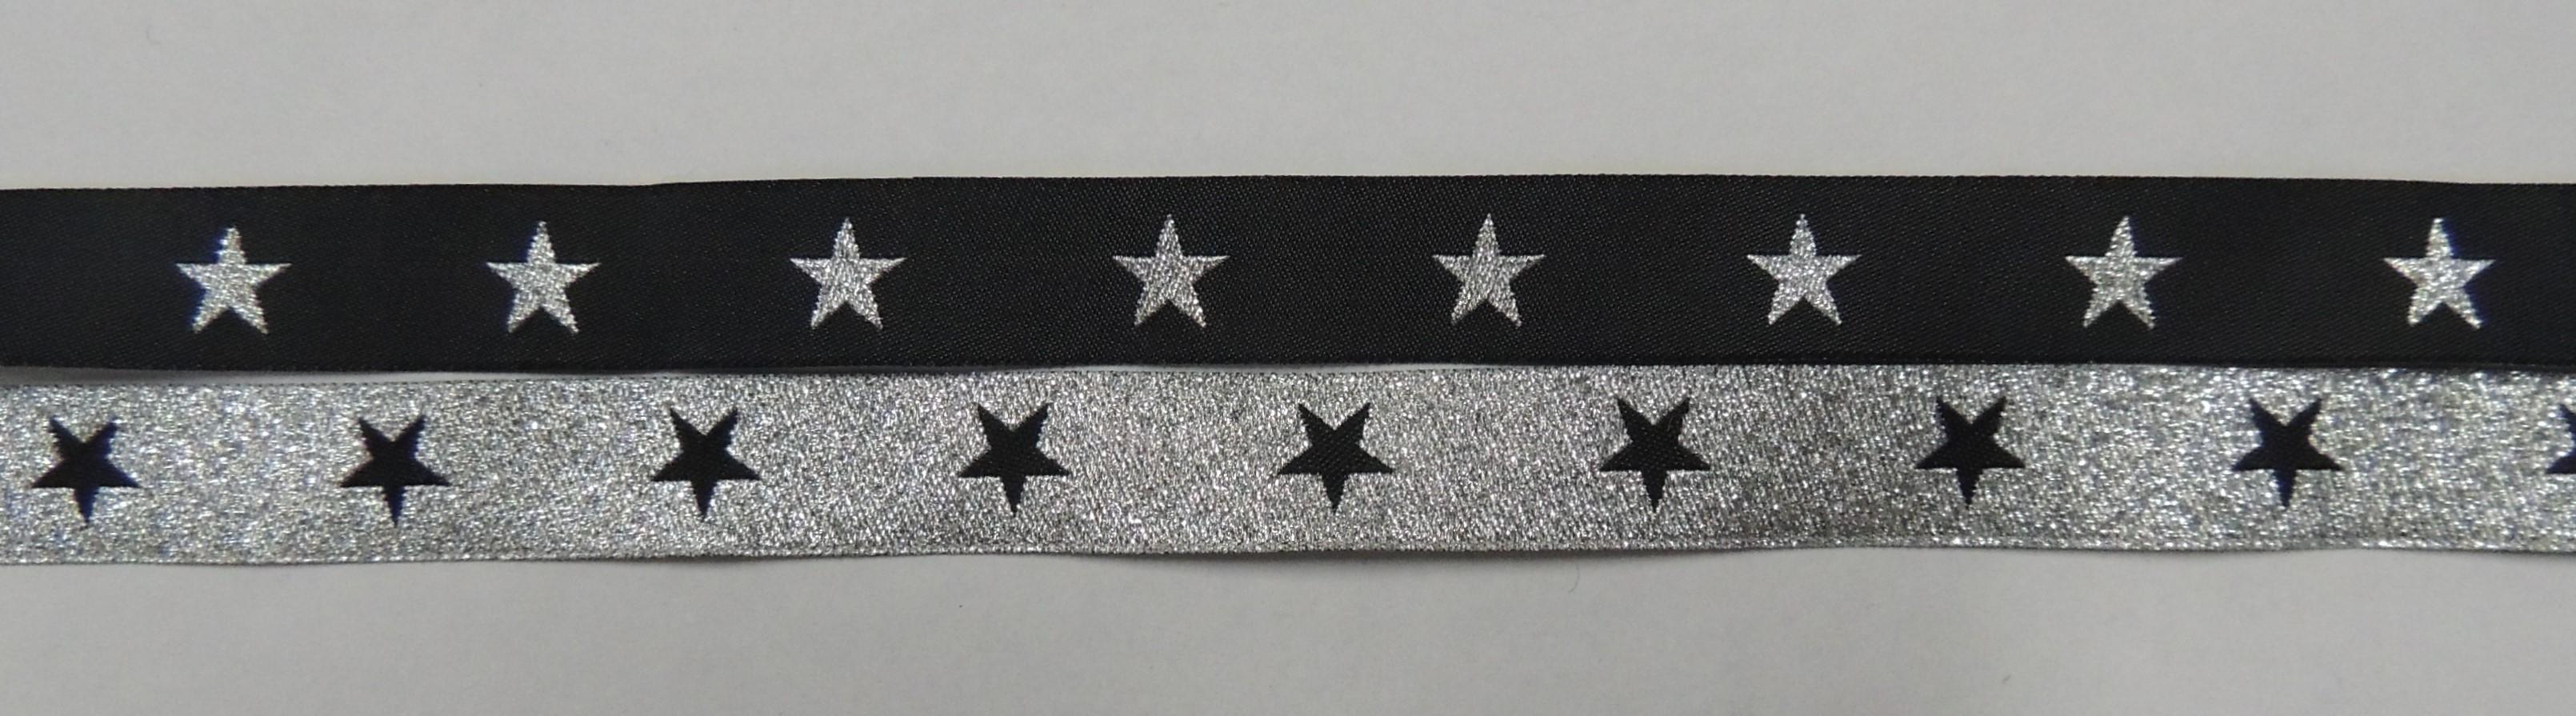 Black with Metallic Silver stars/ Metallic Silver with Black Stars